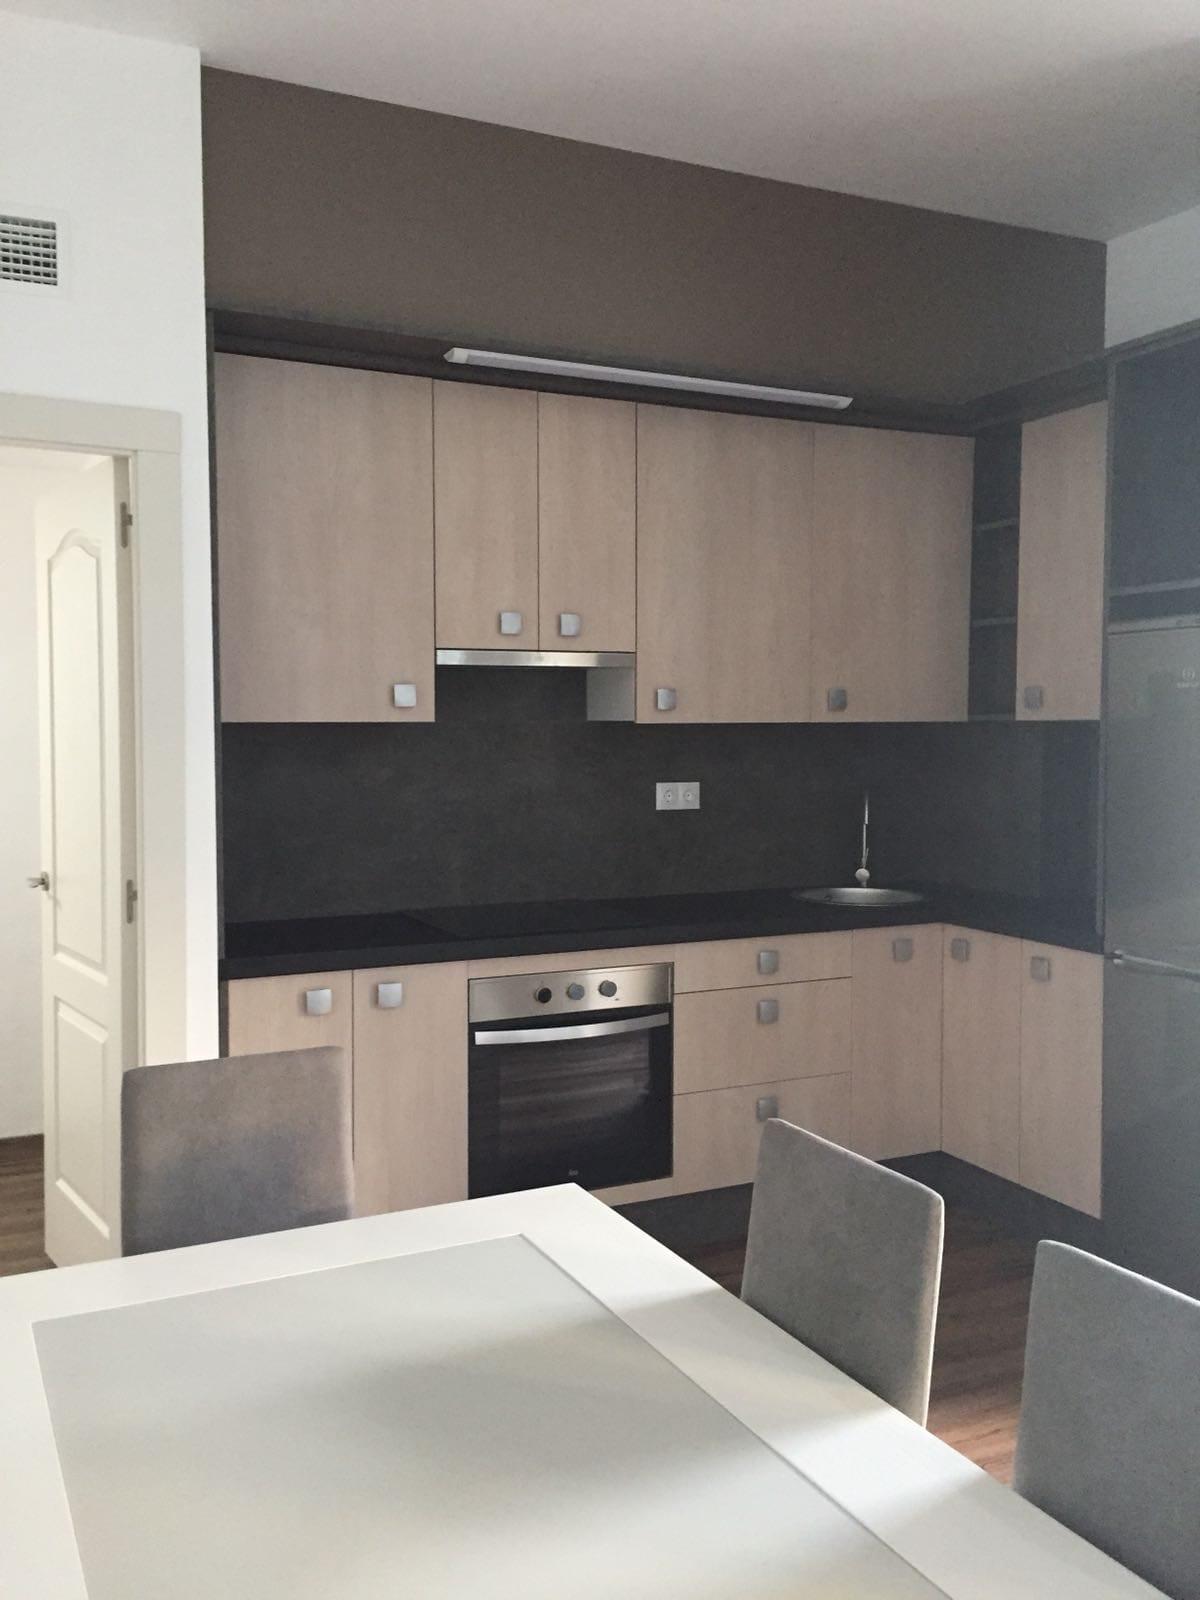 R3305050: Apartment for sale in Estepona